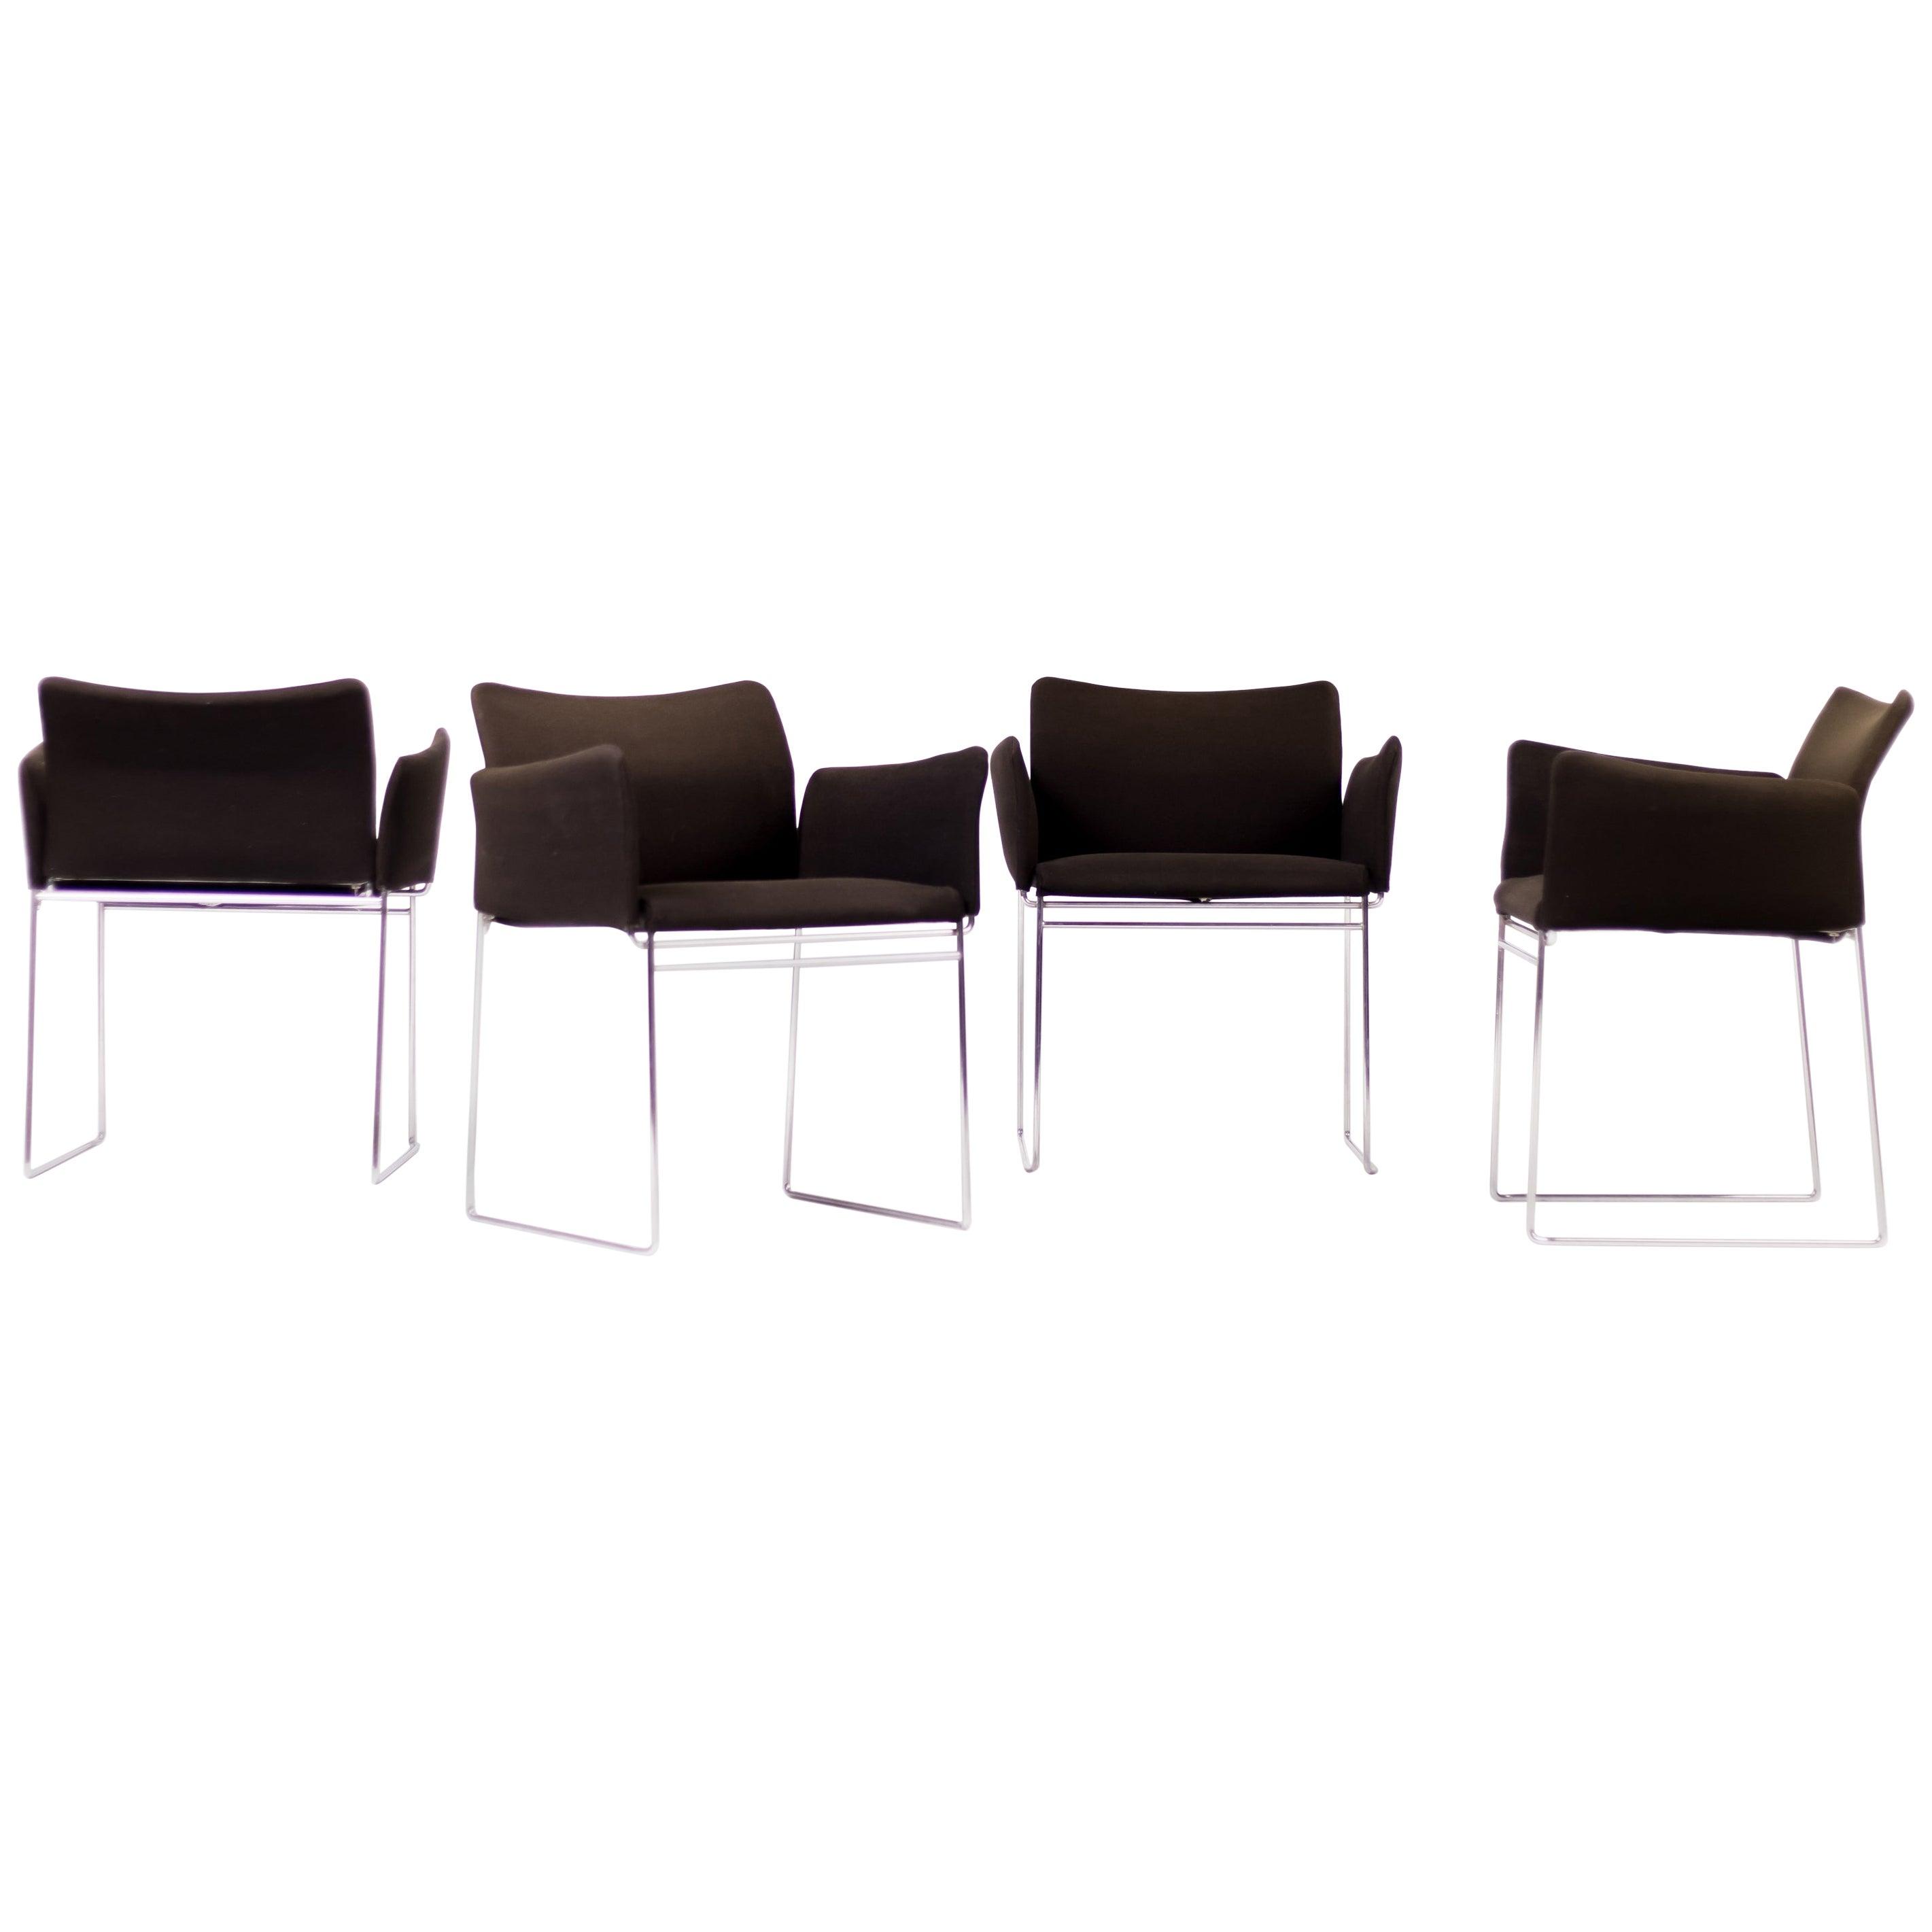 "Set of Four ""Maja"" Chairs by Kazuhide Takahama for Simon Gavina"